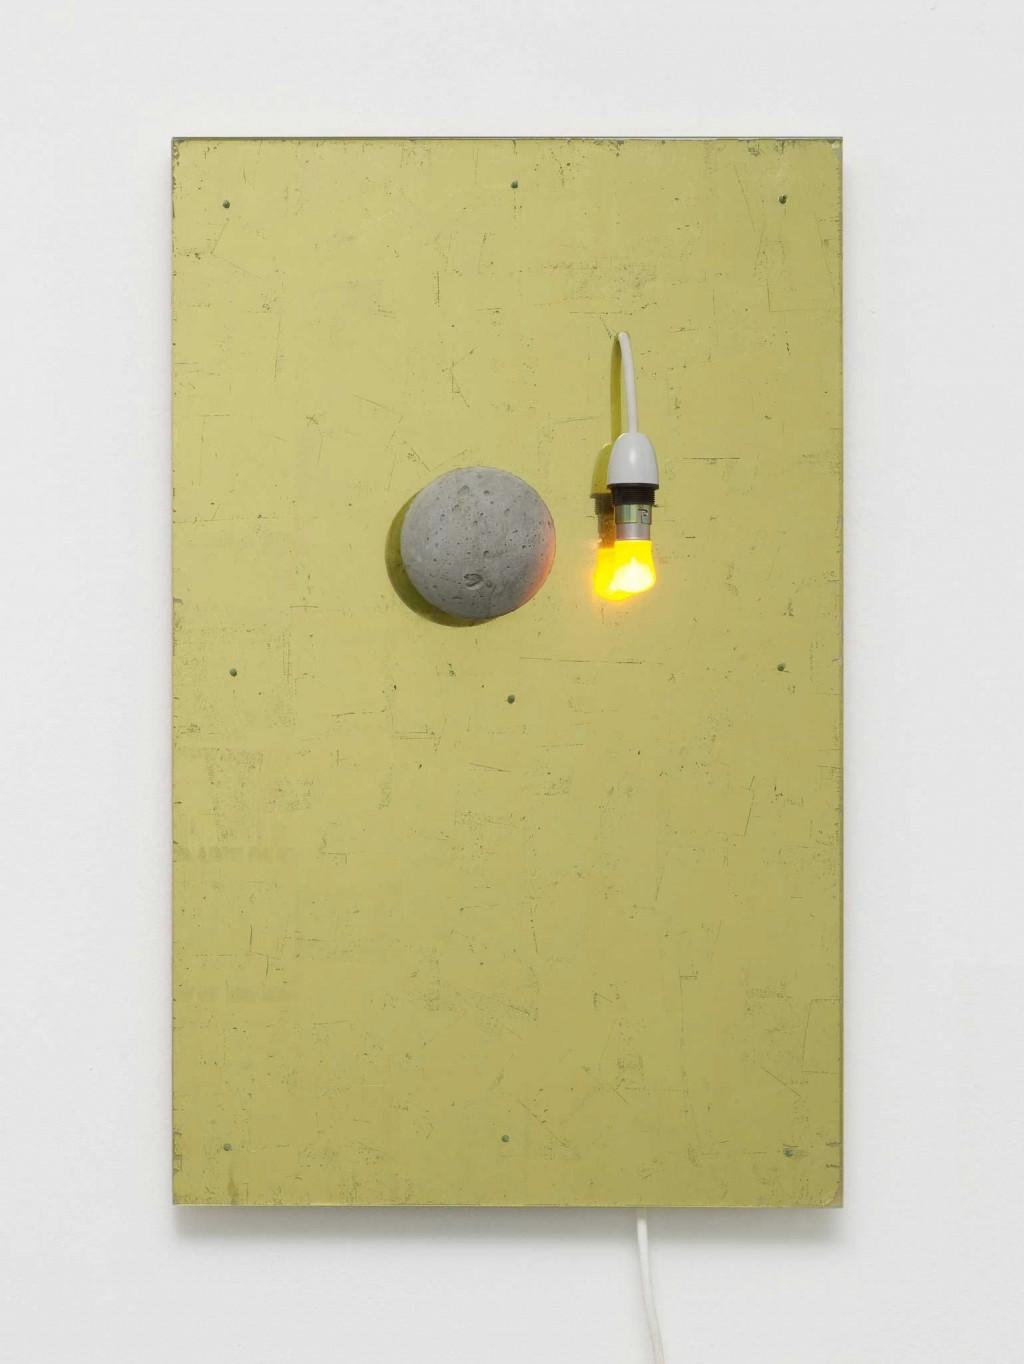 Carl Freedman Gallery 3 Switch Light Fitting 2010 Gold Leaf Concrete Acrylic Sheet Plyboard 69 43 10 Cm